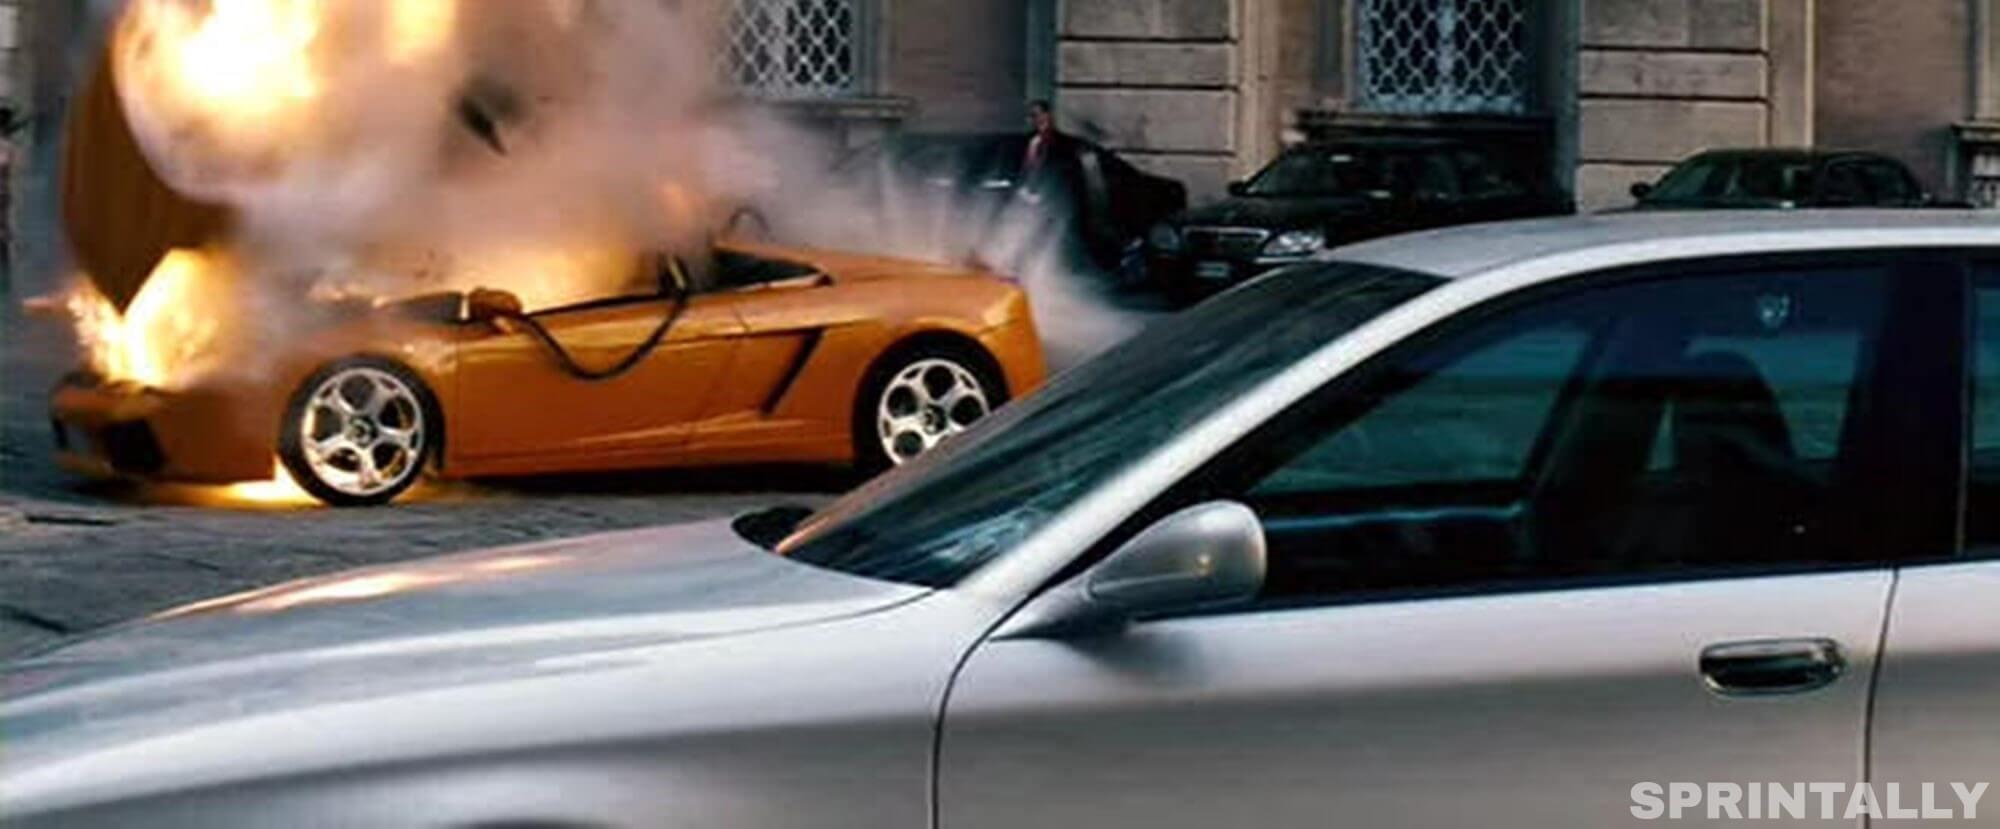 Mission Impossible Lamborghini